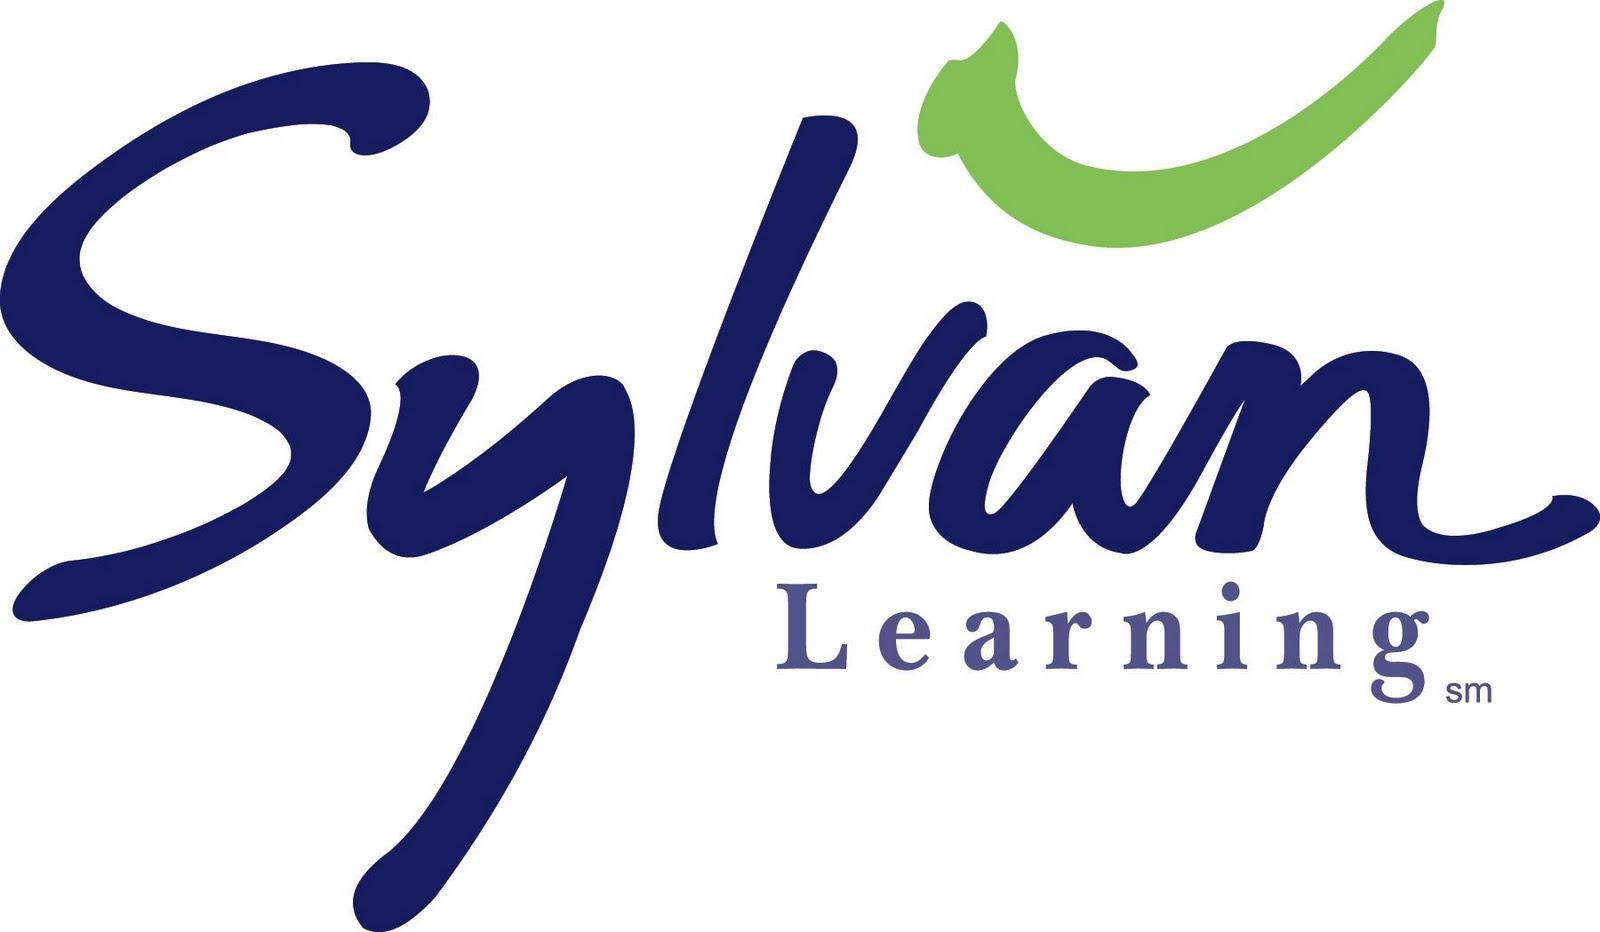 http://1.bp.blogspot.com/-BWgHlU9XXr8/TbmUTTHci2I/AAAAAAAAAA4/3OkNgecFae8/s1600/Sylvan+Logo.jpg